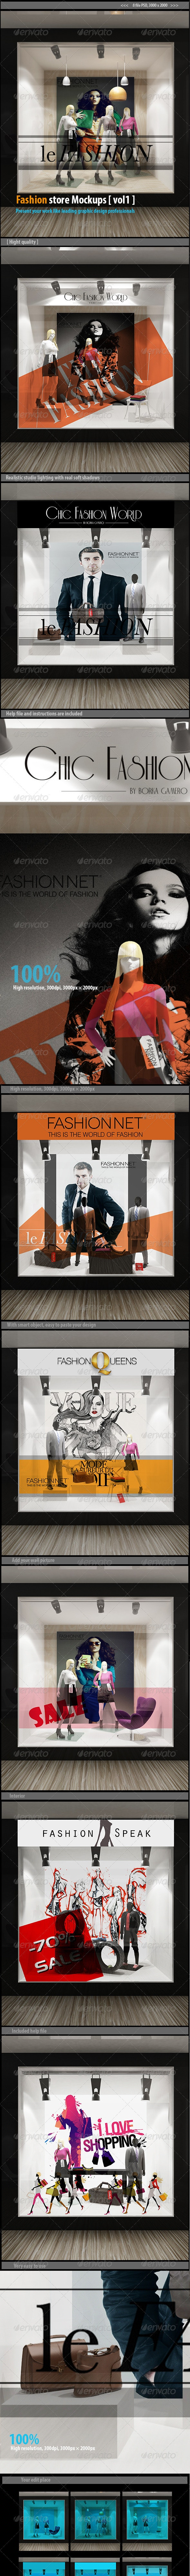 Fashion sotre mockups [vol1] - Posters Print